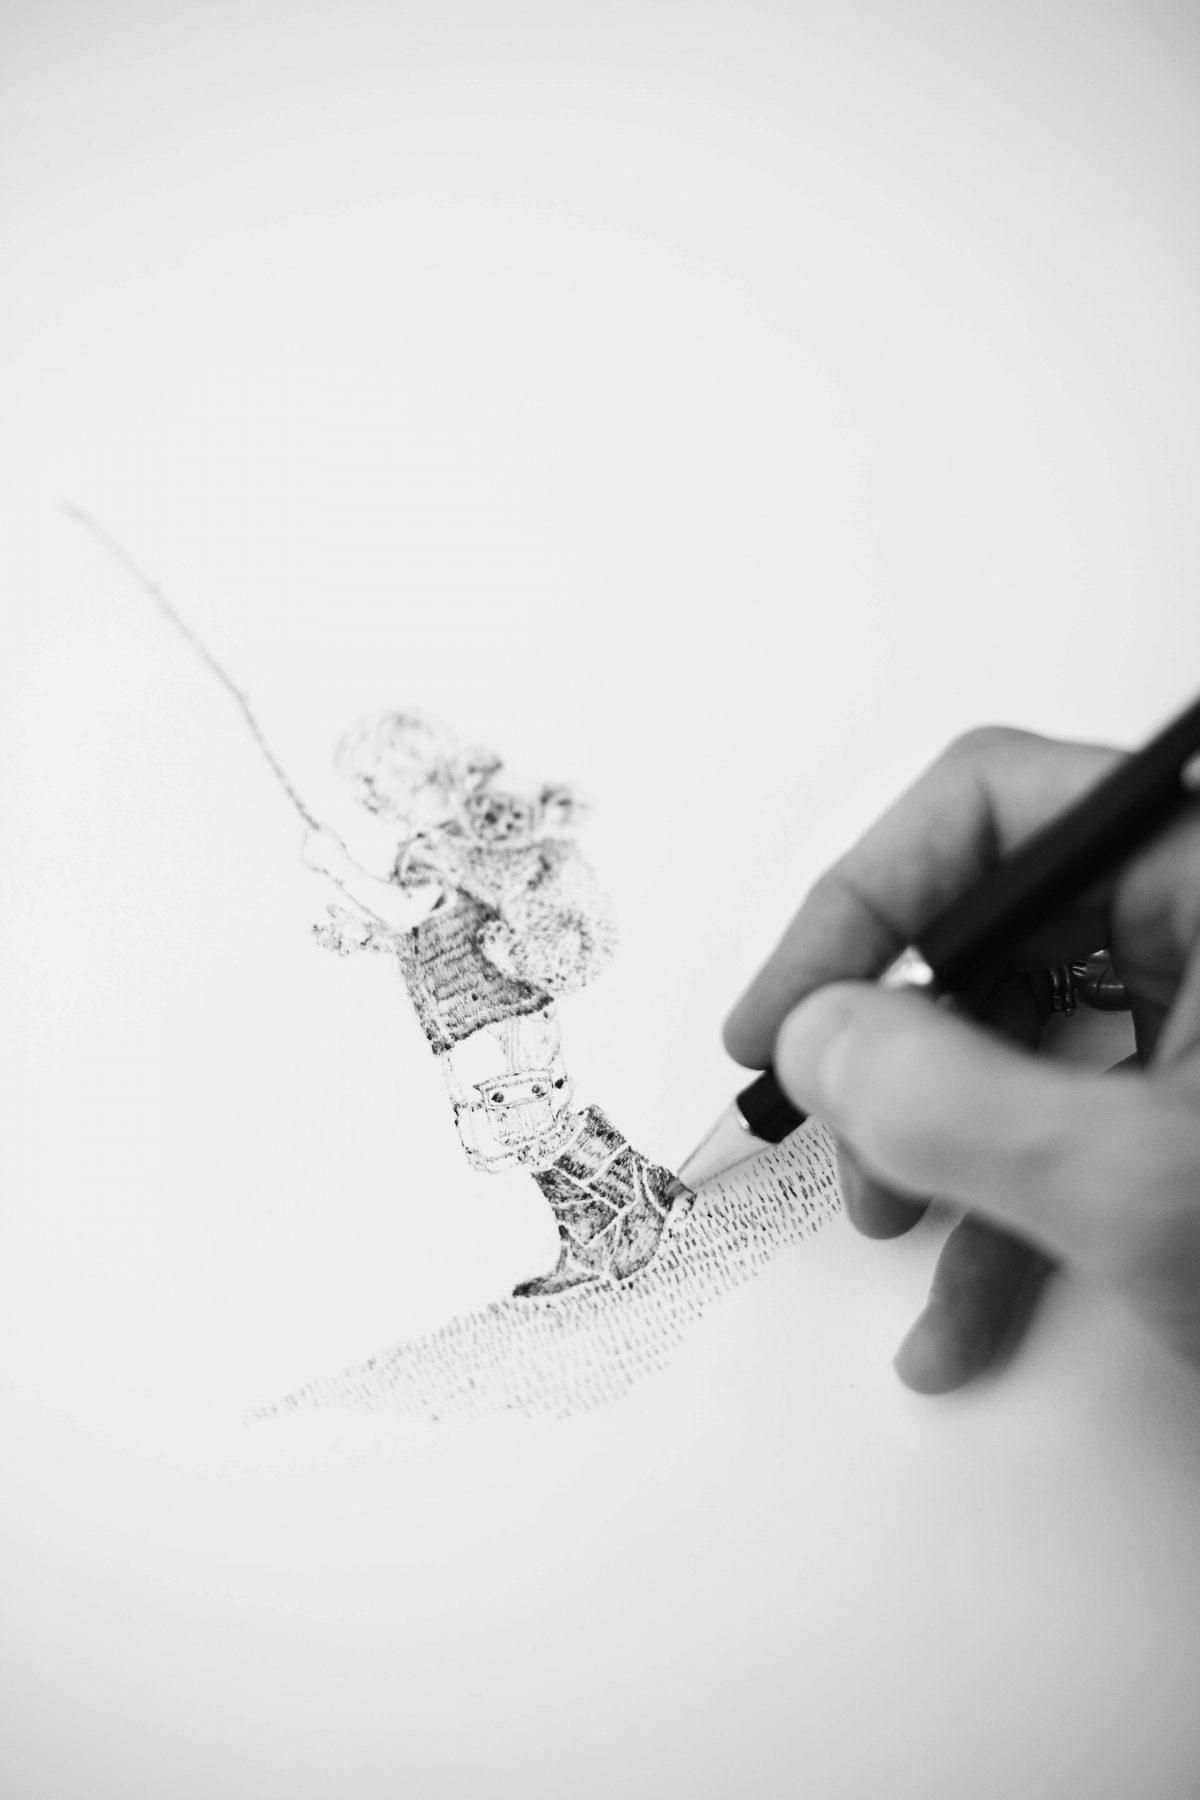 Kate drawing in her studio.